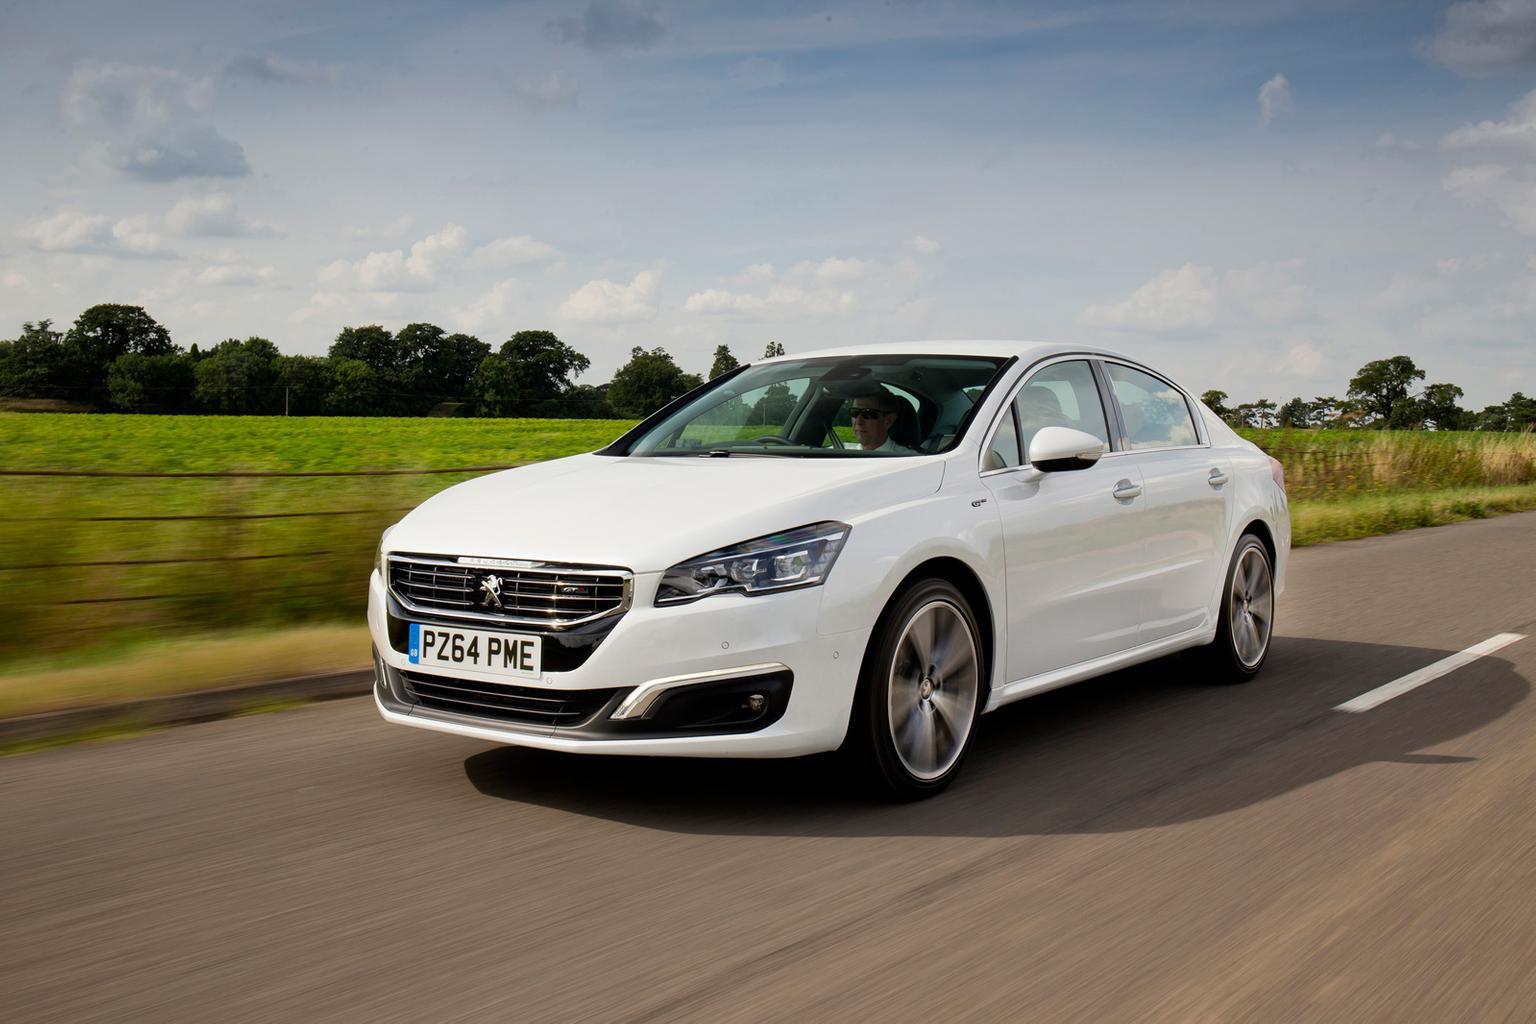 2014 Peugeot 508 review